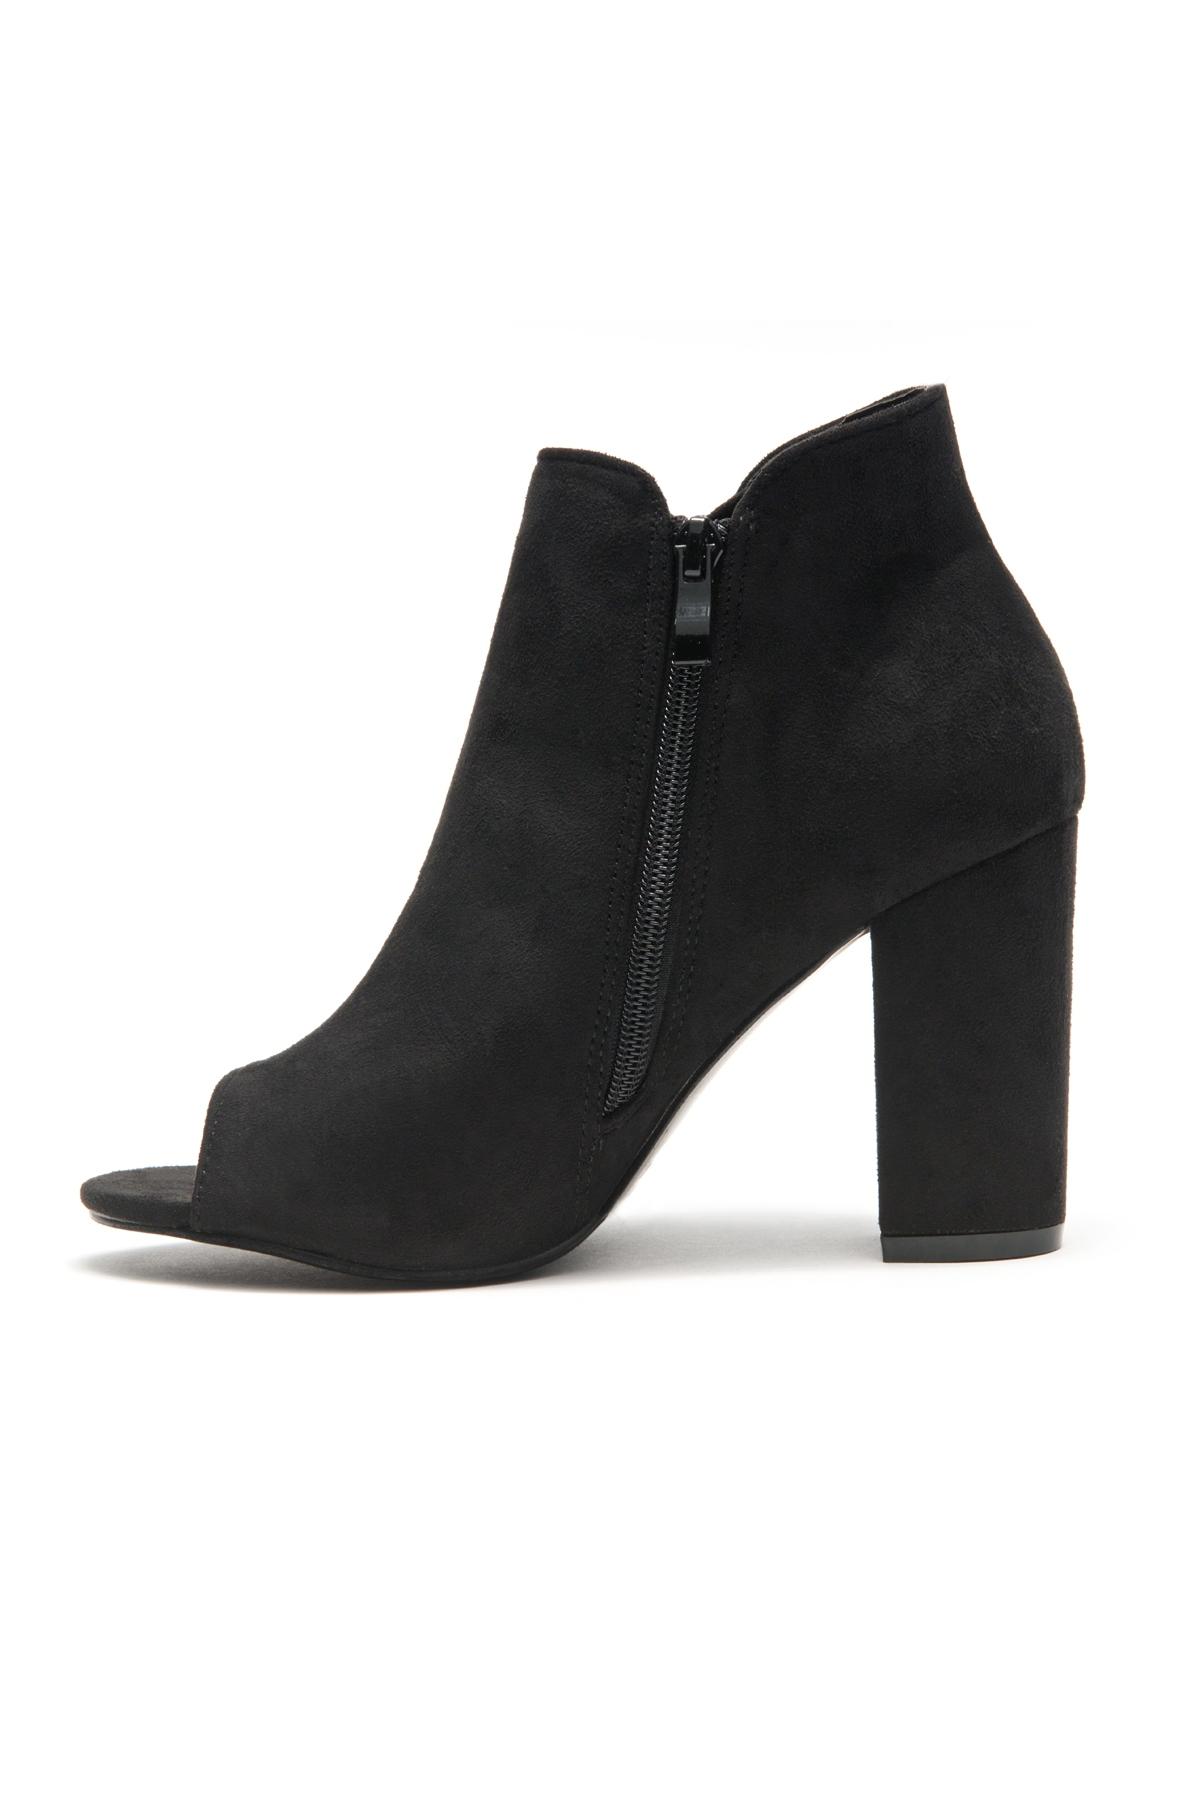 Snoorrii Side Lace up Toe Peep Toe Chunky Heeled Booties (Black)